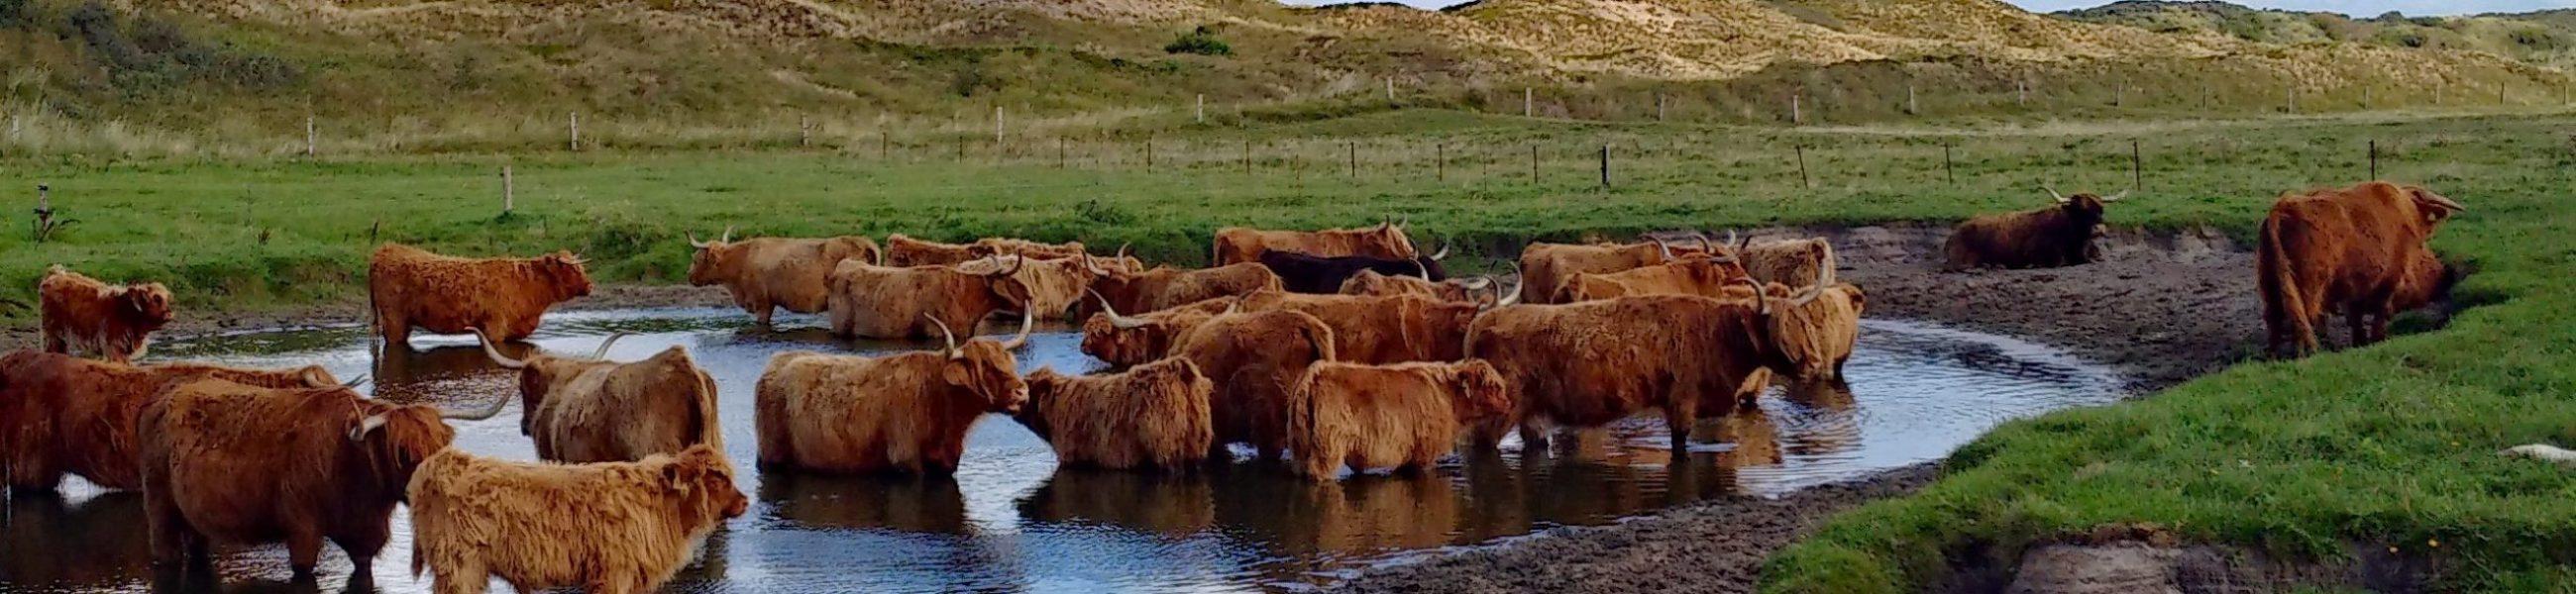 highland-beef-3347997